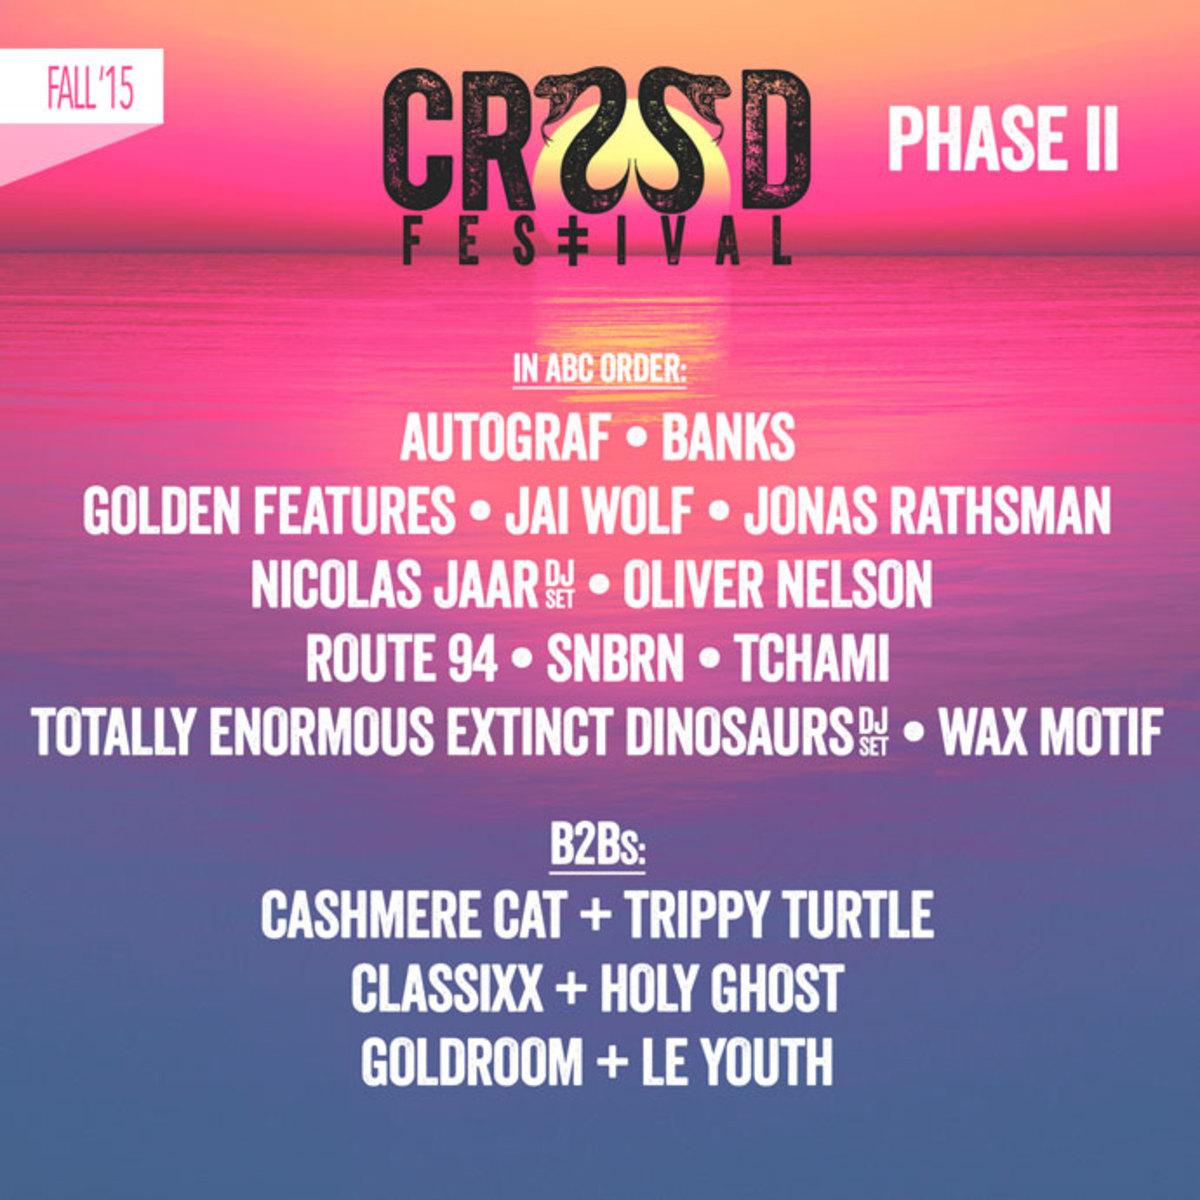 CRSSD Festival Announces Phase II Lineup